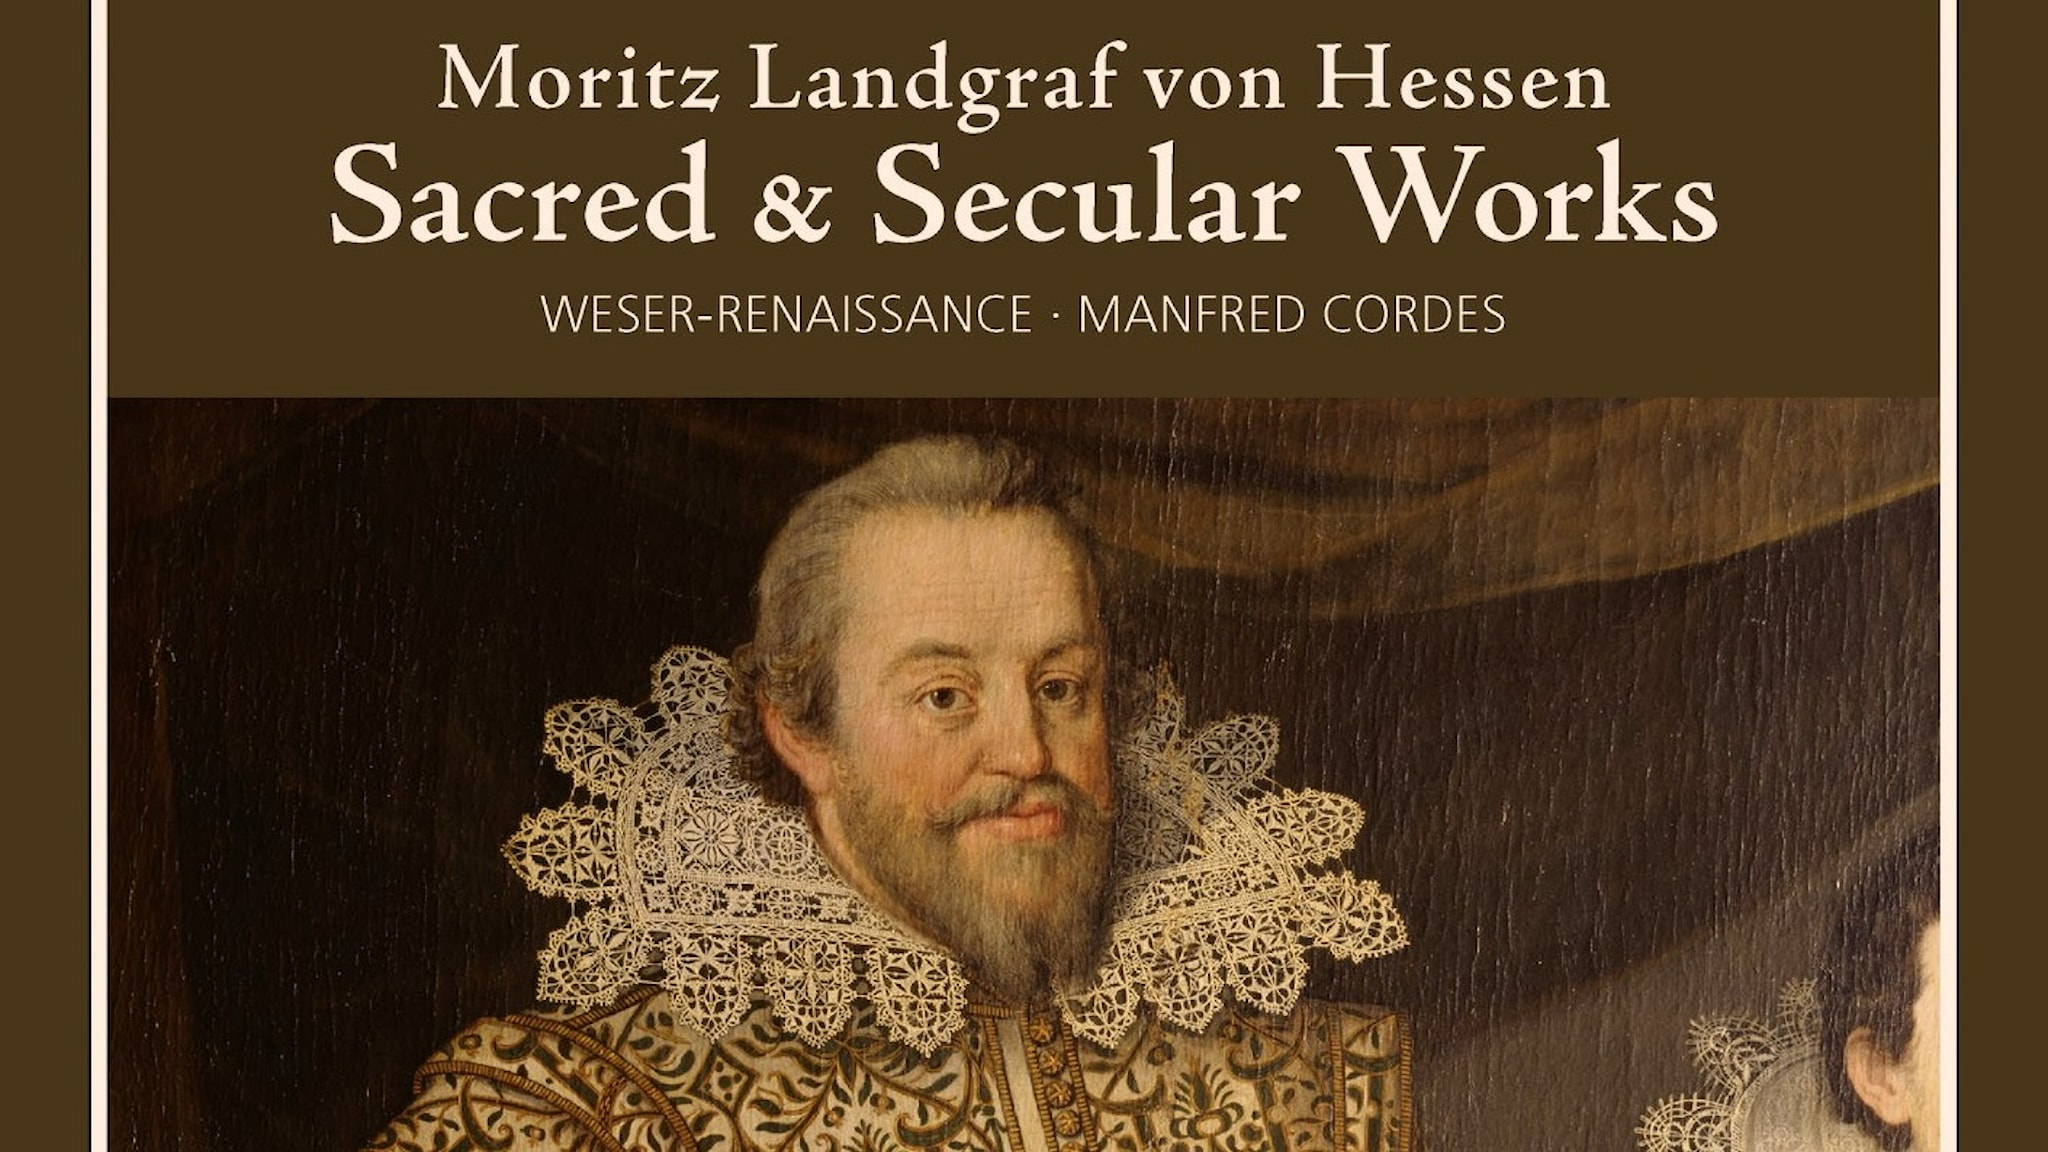 Omslag till Weser Renaissances album med musik av Moritz (Lantgraf von Hessen)